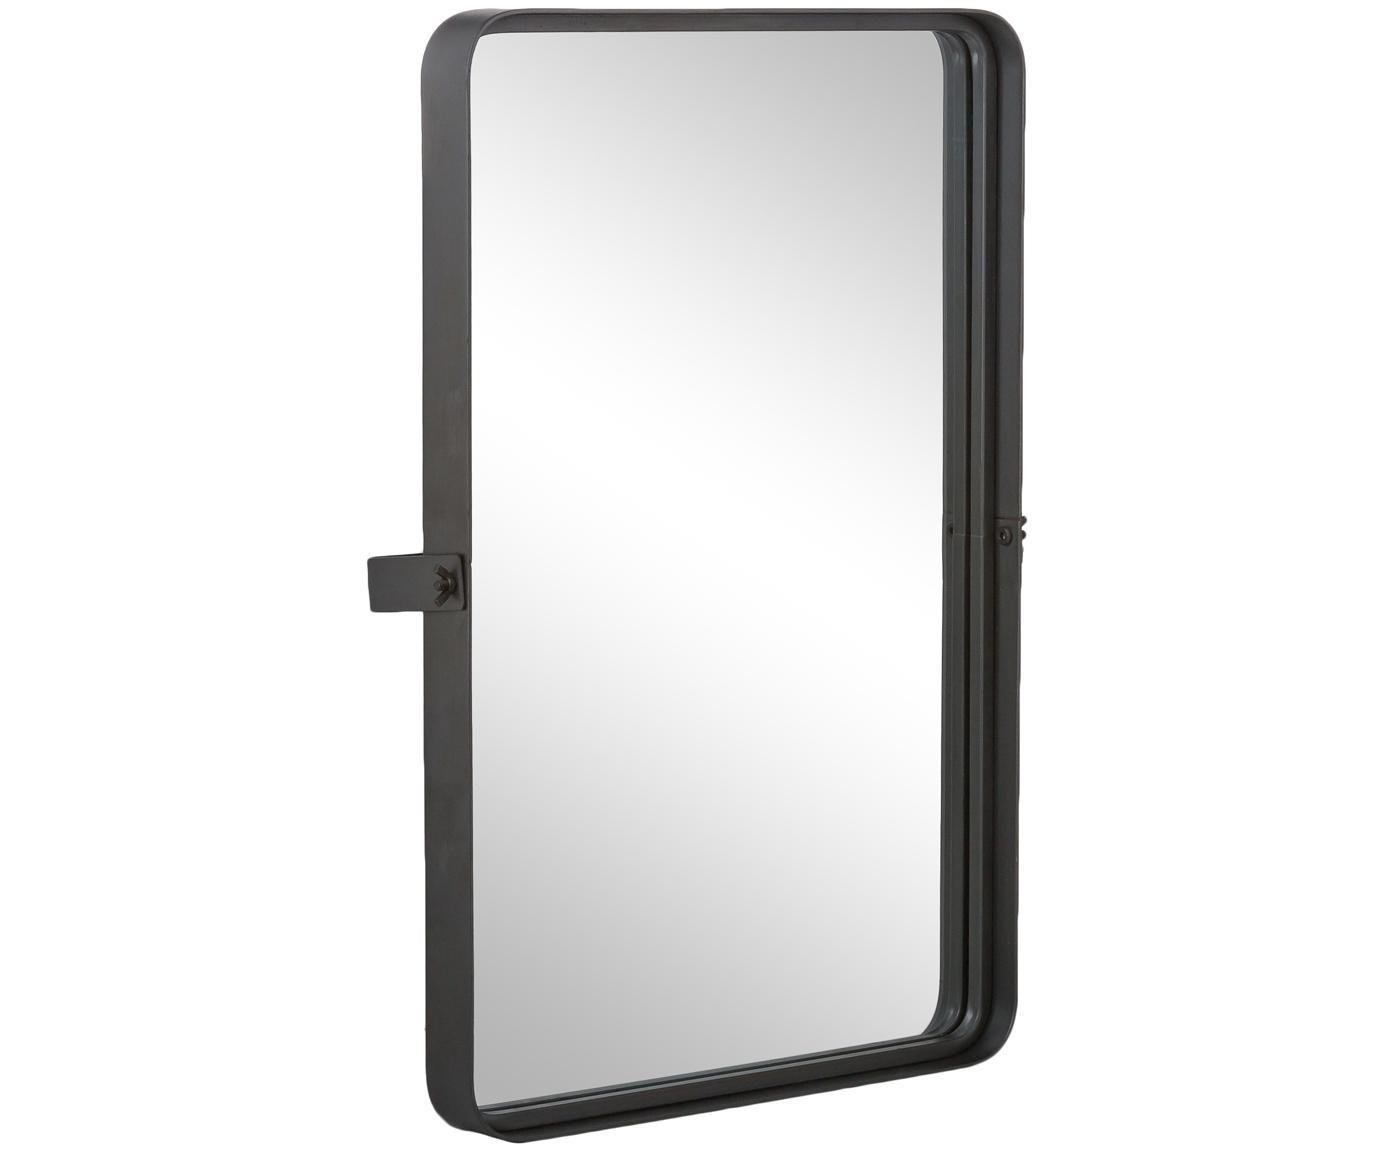 Espejo de pared cuadrado Poke L, Estructura: tablero de fibras de dens, Espejo: cristal, Gris oscuro, espejo, An 41 x Al 60 cm